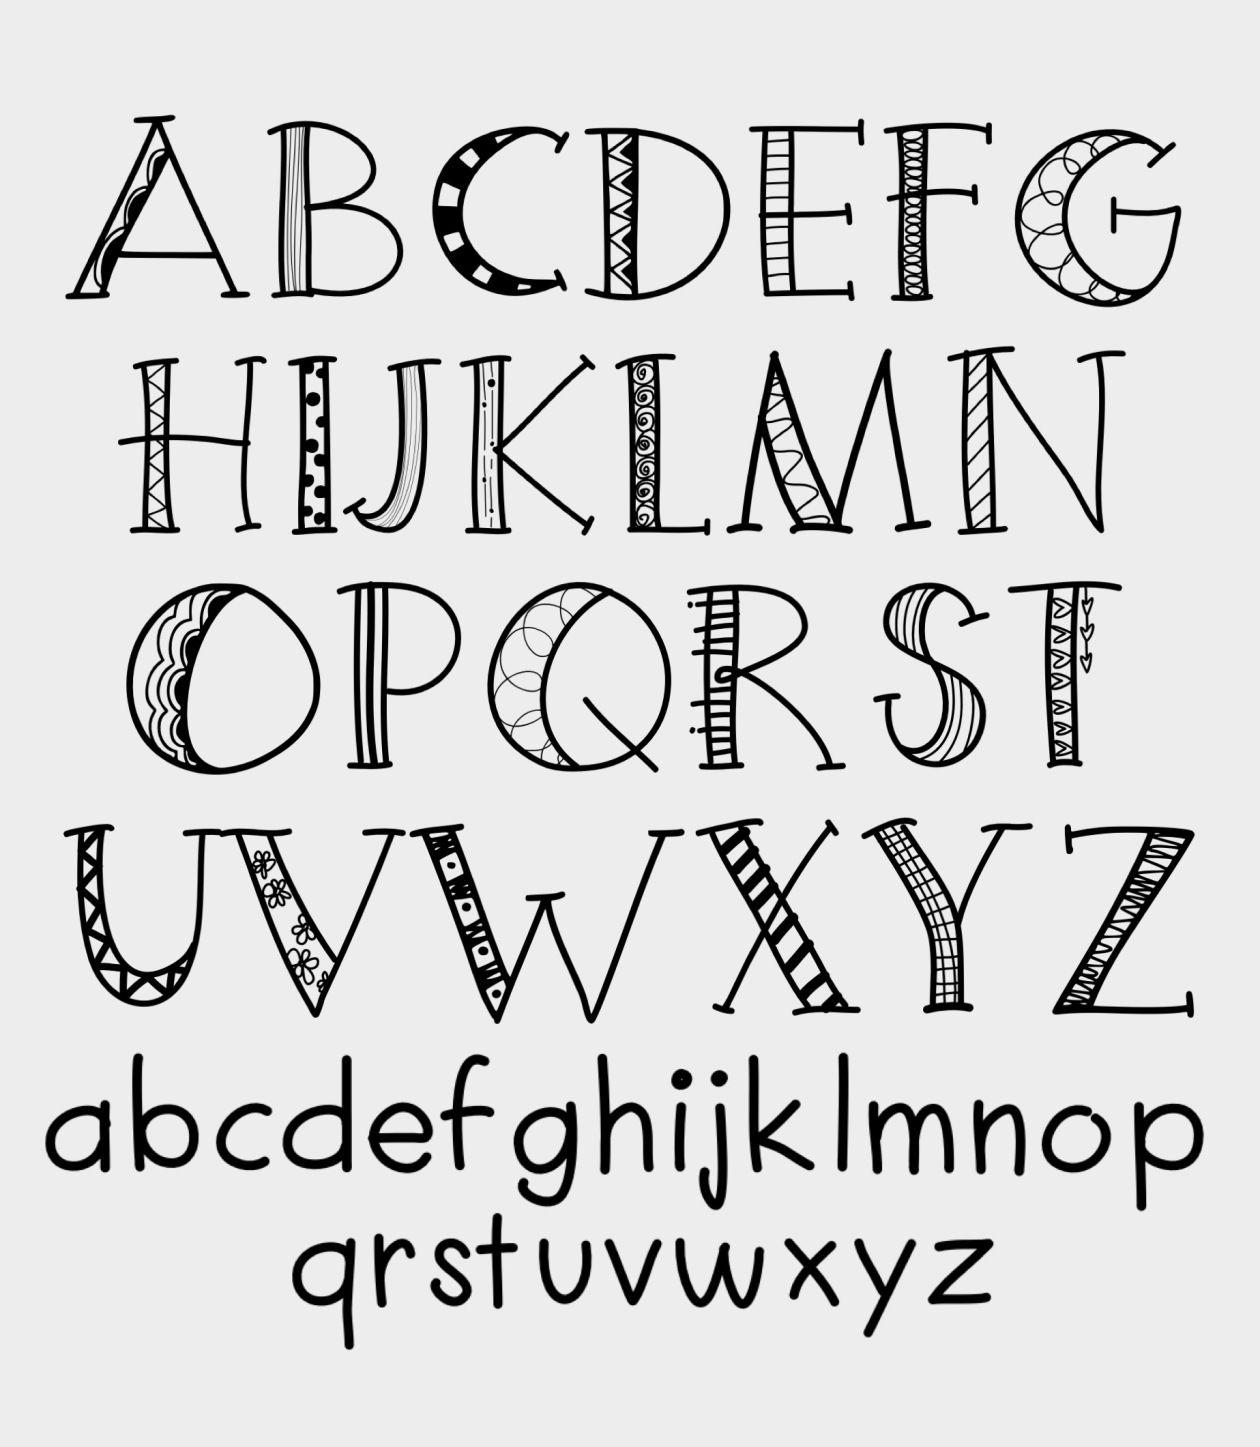 Free Downloadable Font Lettering Alphabet Lettering Alphabet Fonts Hand Lettering Fonts